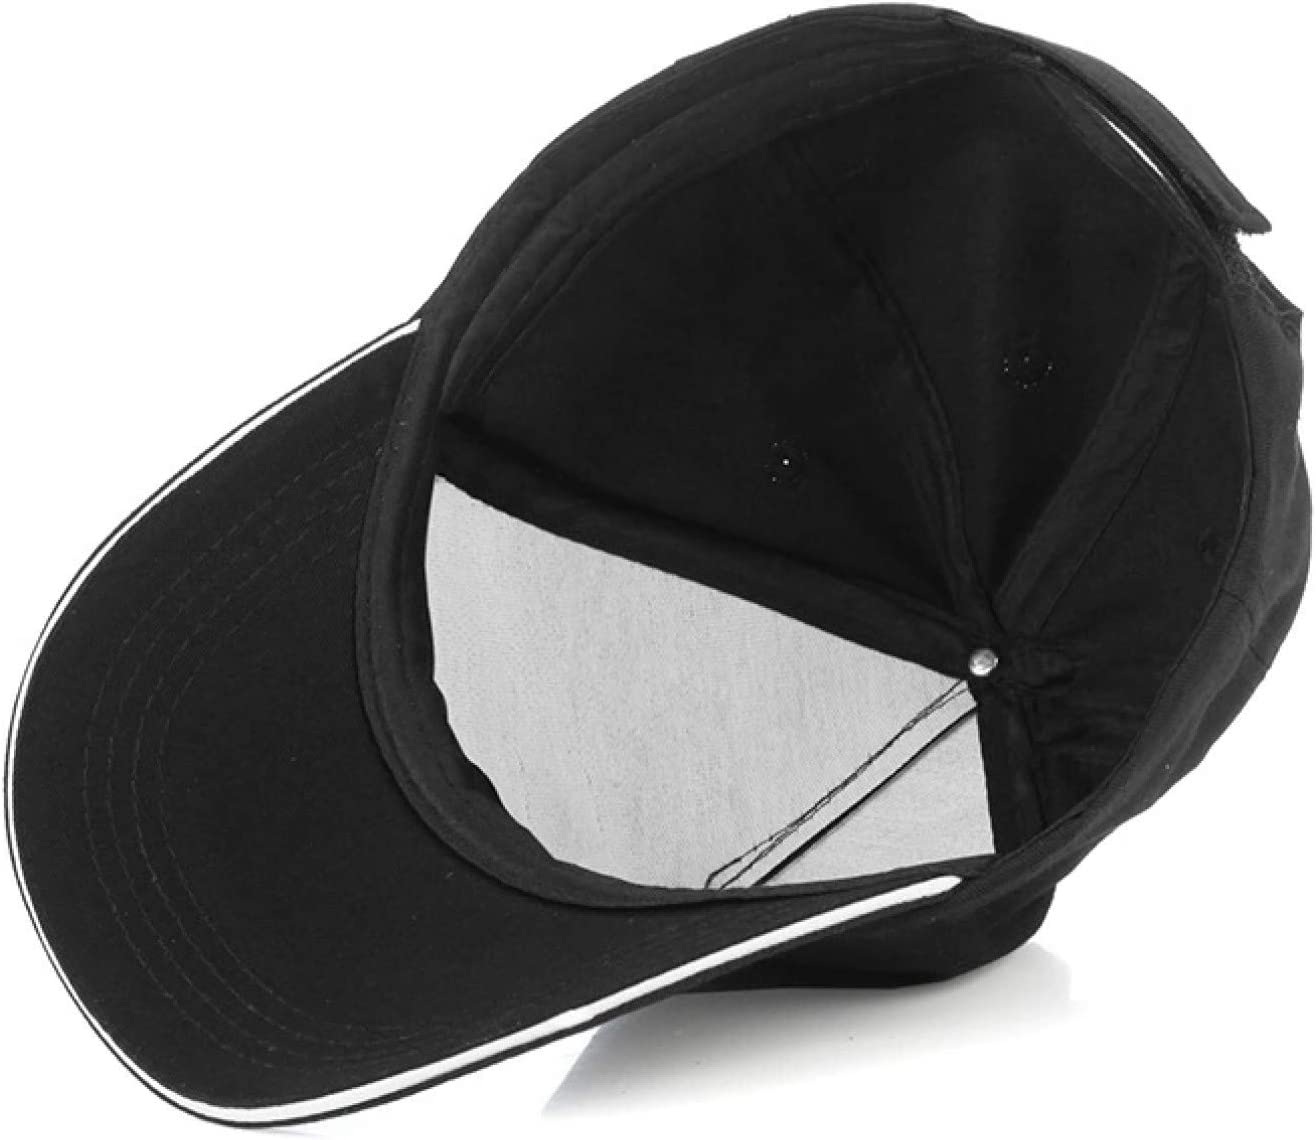 N////A Baseballm/ütze Cocaines Caviar Hip Hop Hut M/änner Frauen Baseball Caps Unisex Snapback H/üte Solid Colors Cotton Bone